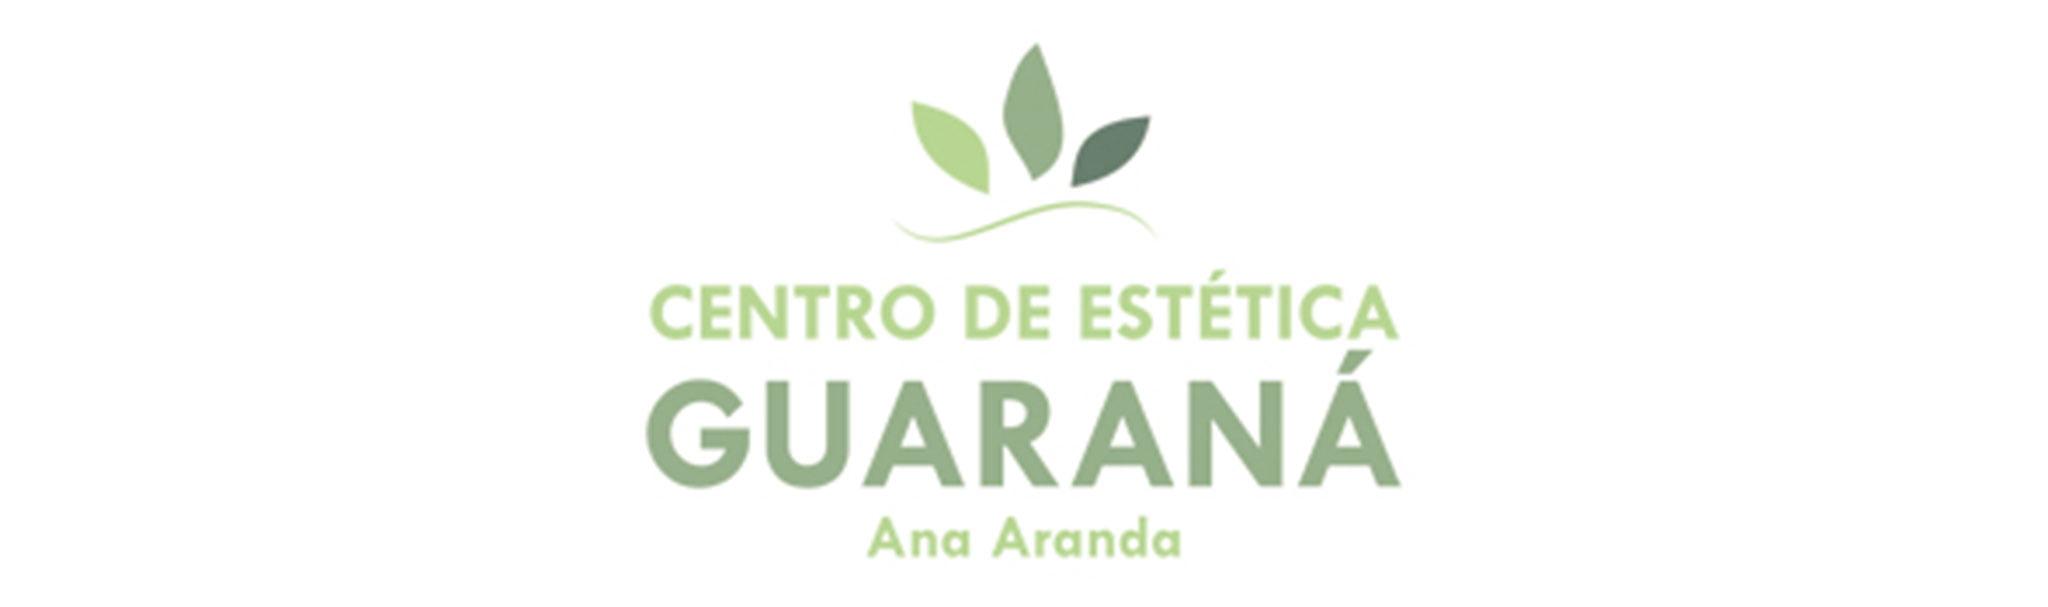 Guaraná Aesthetic Center logo